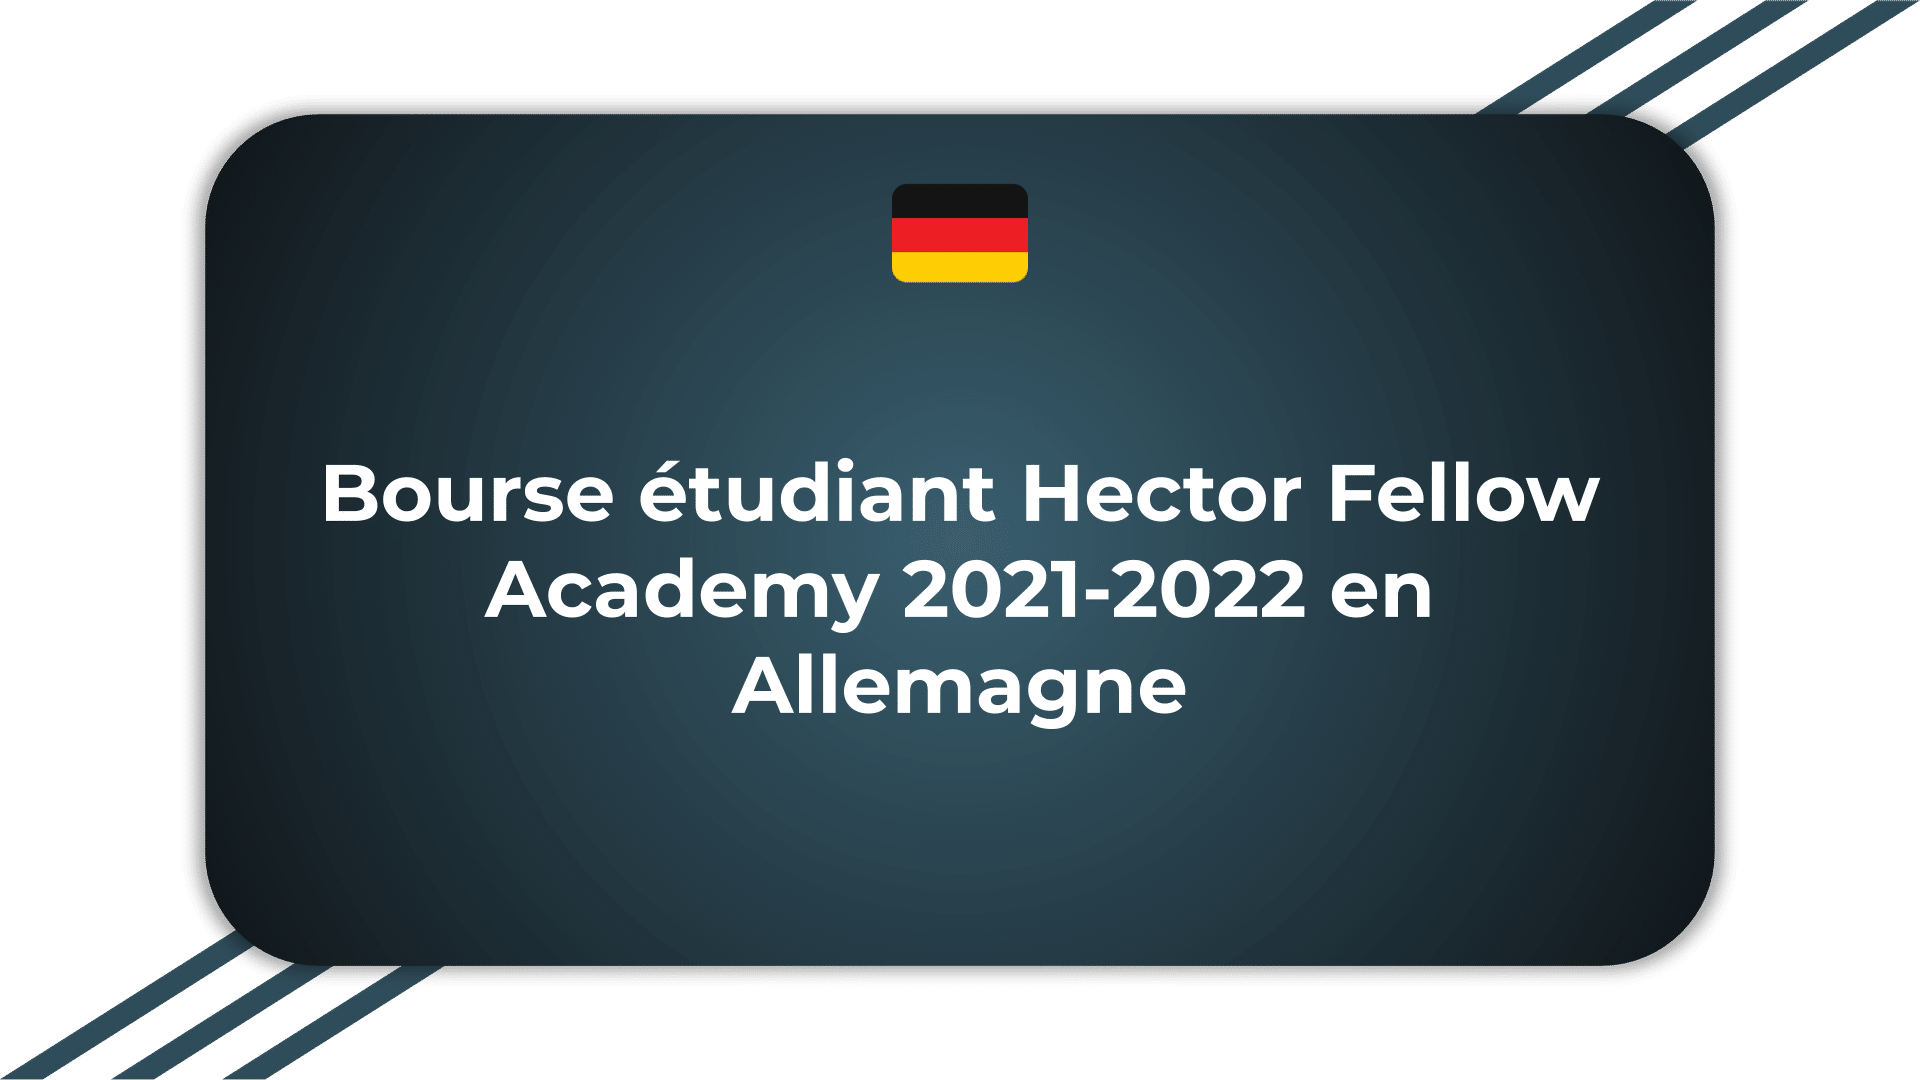 Bourse étudiant Hector Fellow Academy